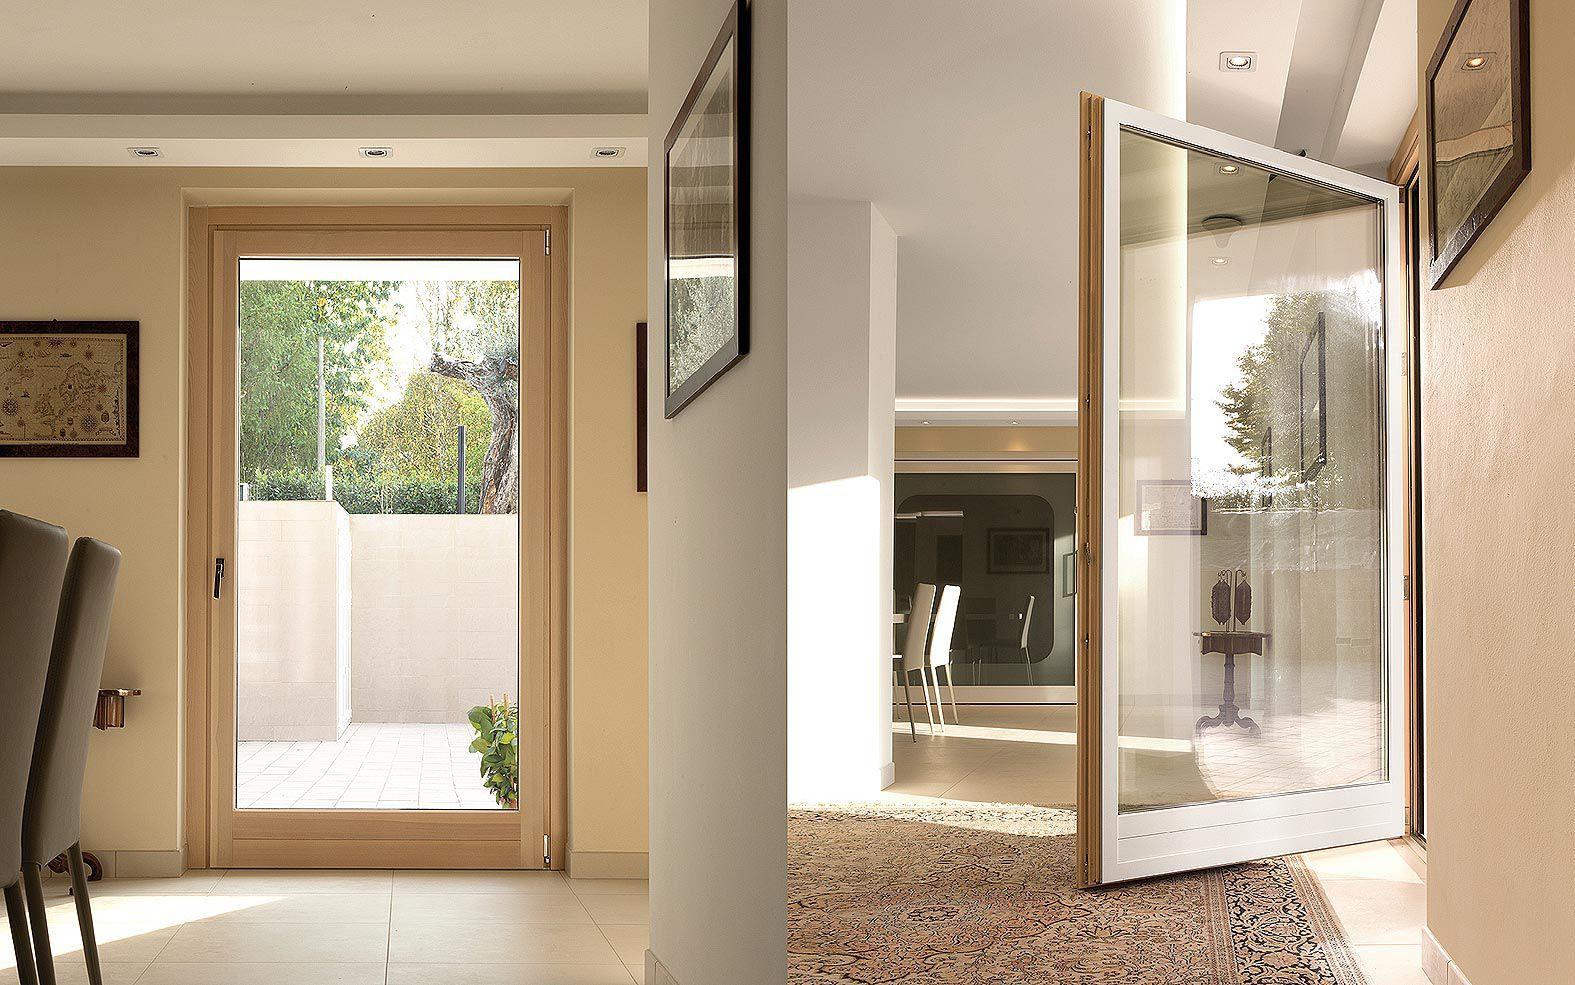 puerta ventana de aluminio con persiana incorporada